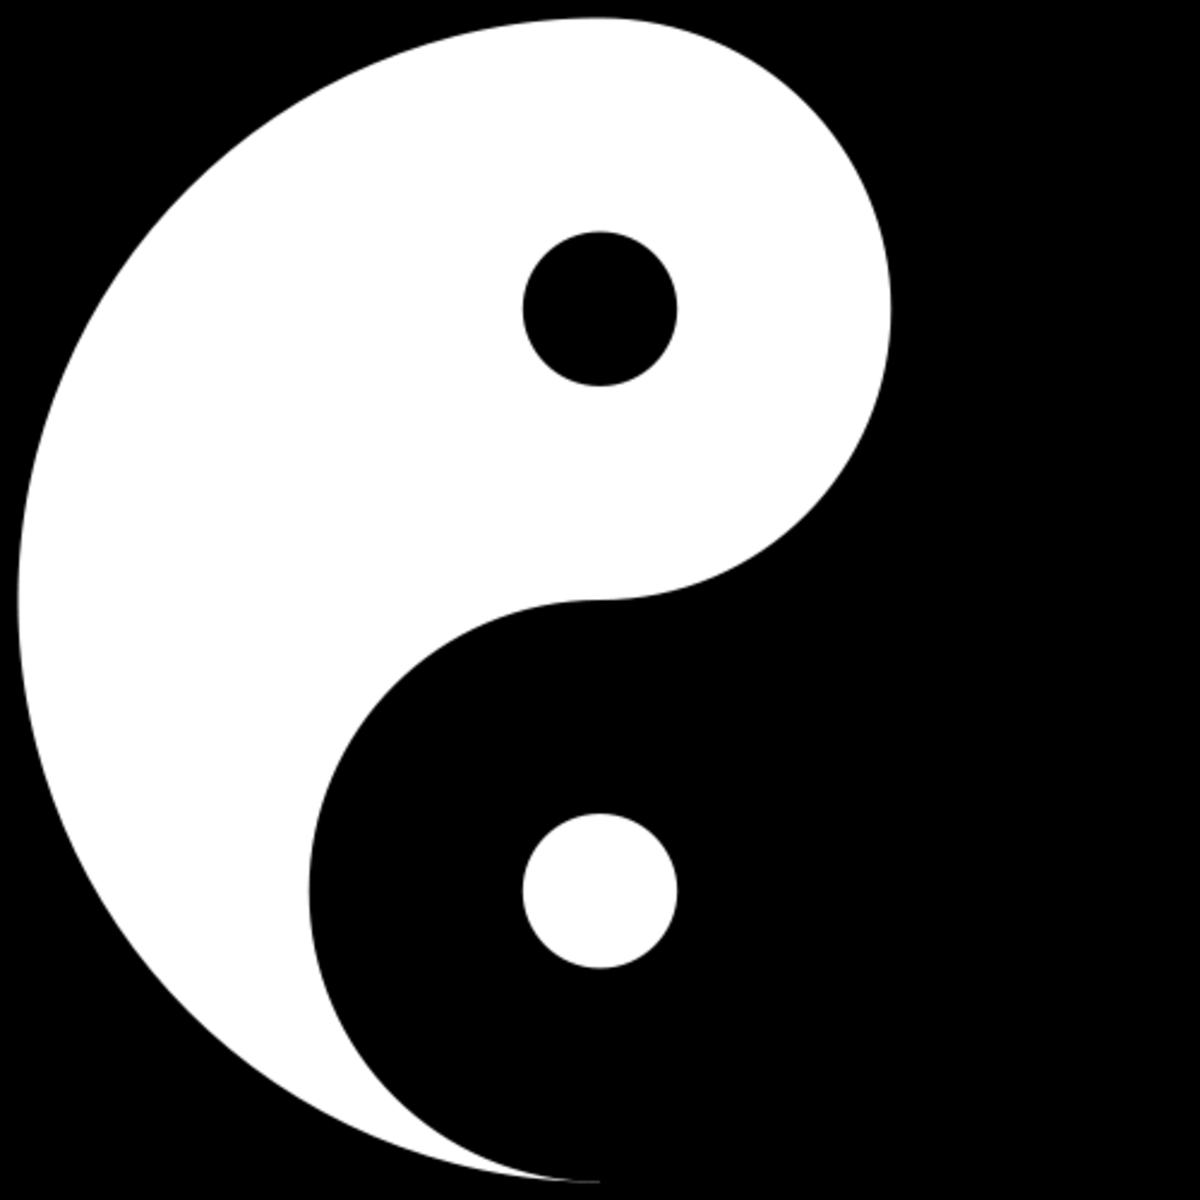 Symbol of Polarity.